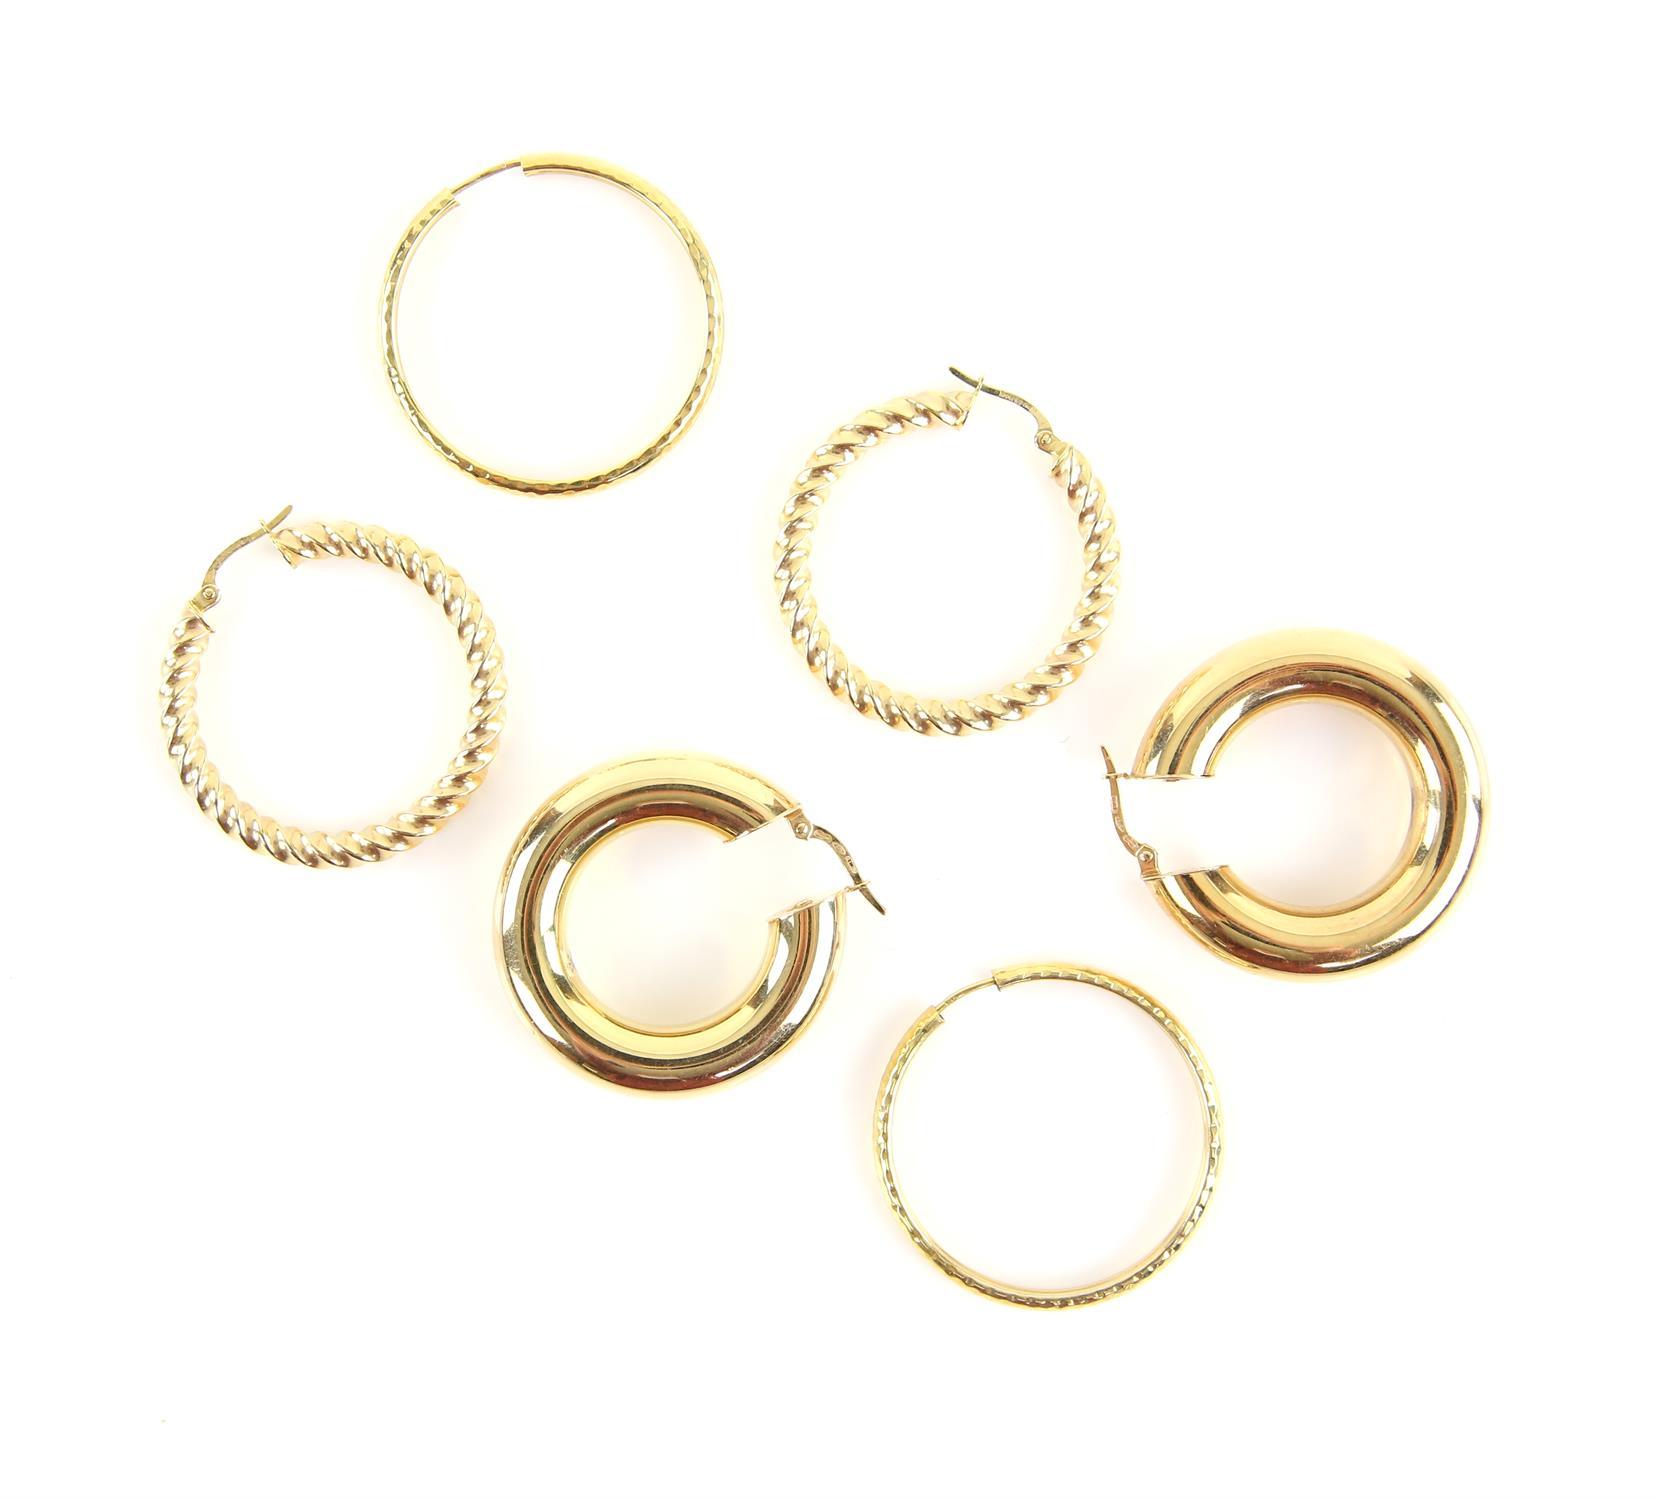 Three pairs of hoop earrings, including a pair of twisted gold hoops, measuring 3.